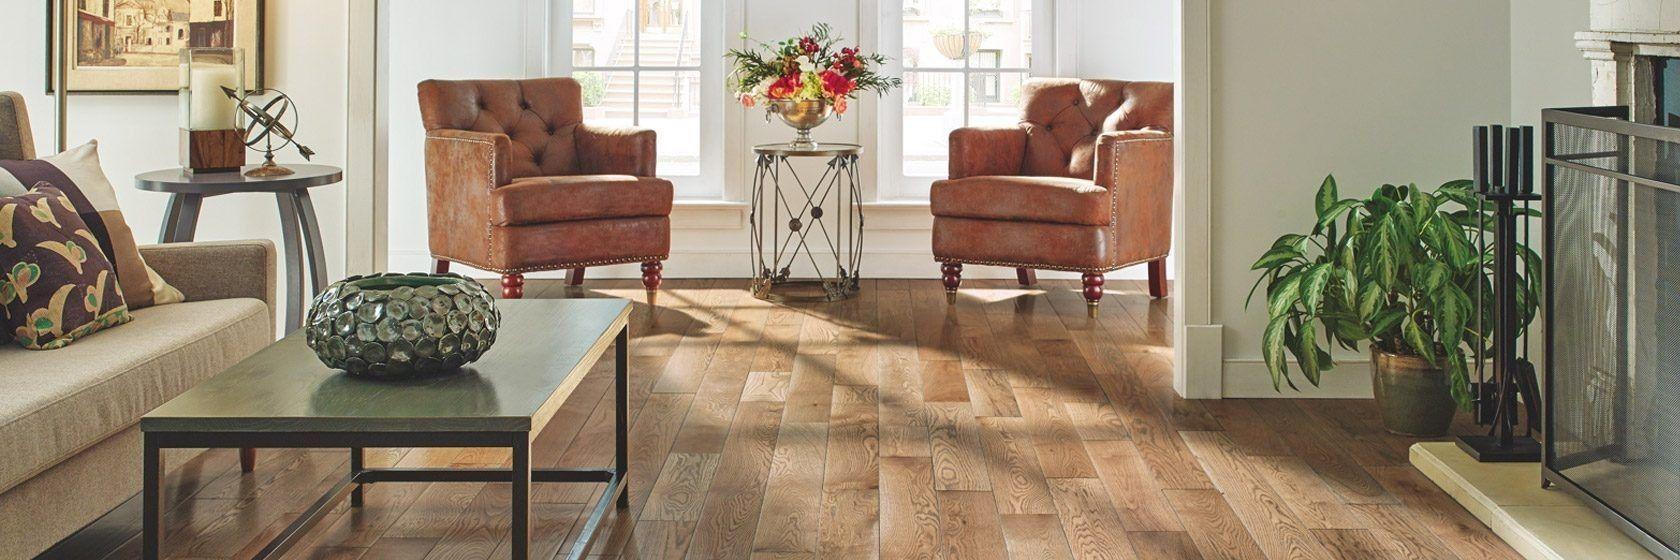 20 Awesome Installing Prefinished Hardwood Floors Yourself